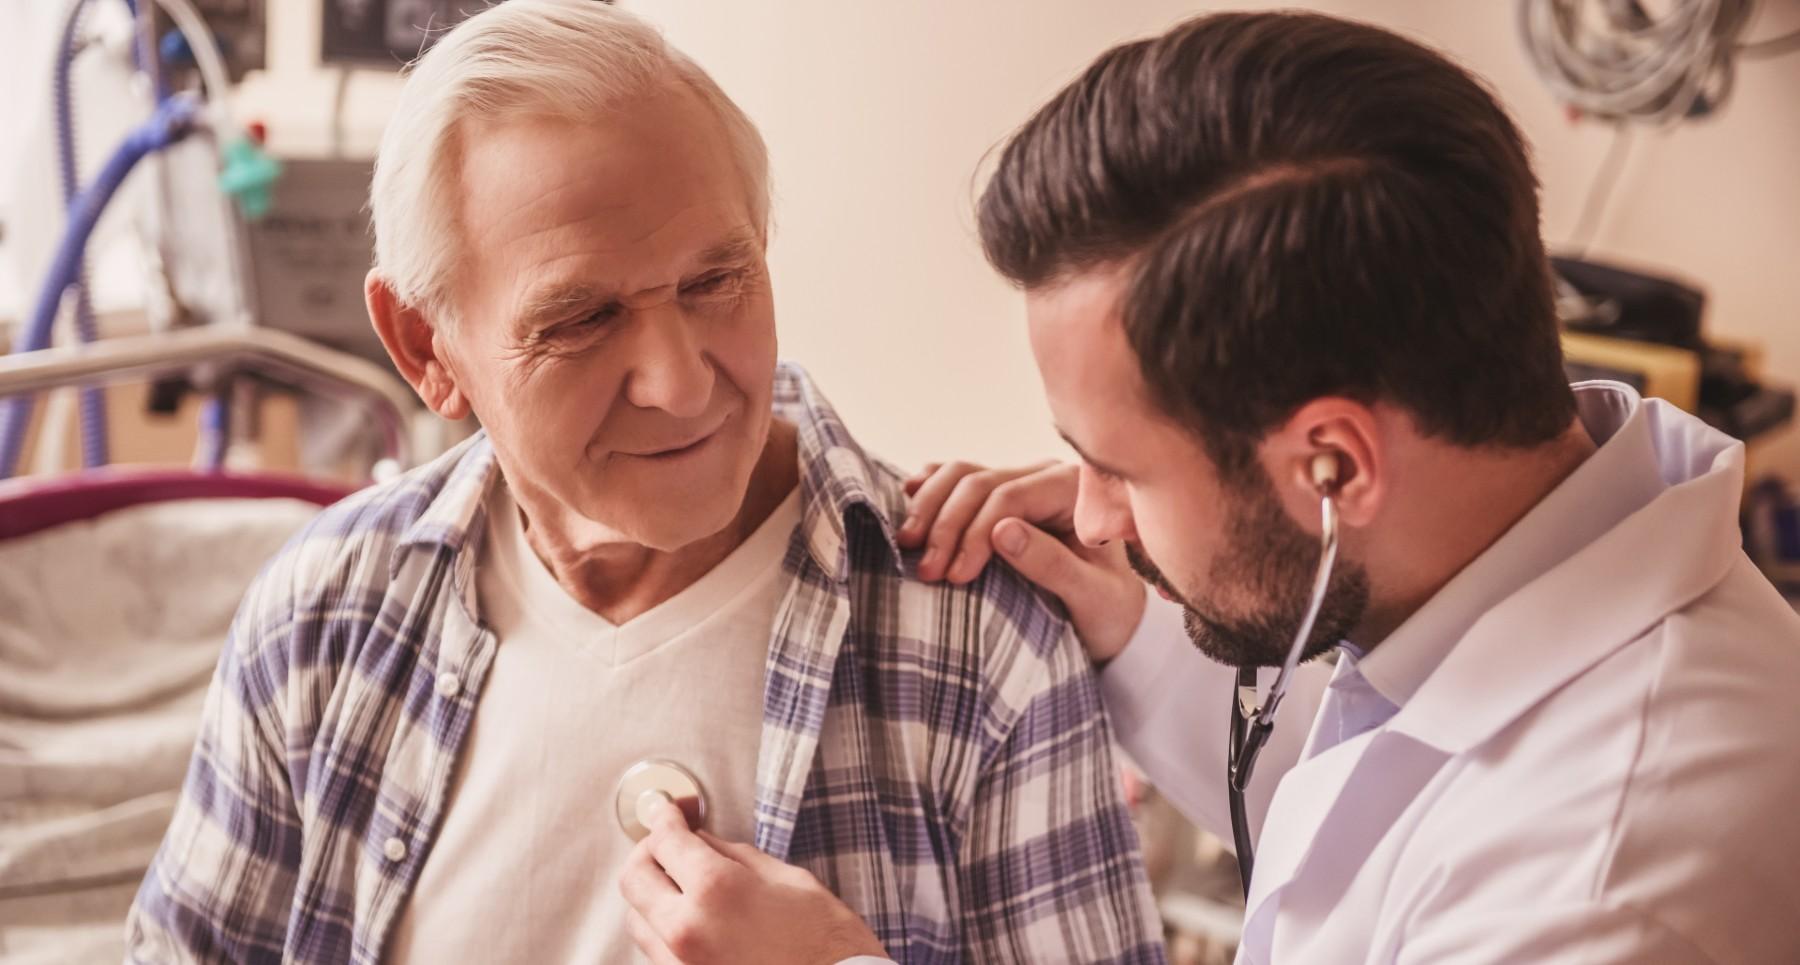 Medical tests for heart disease